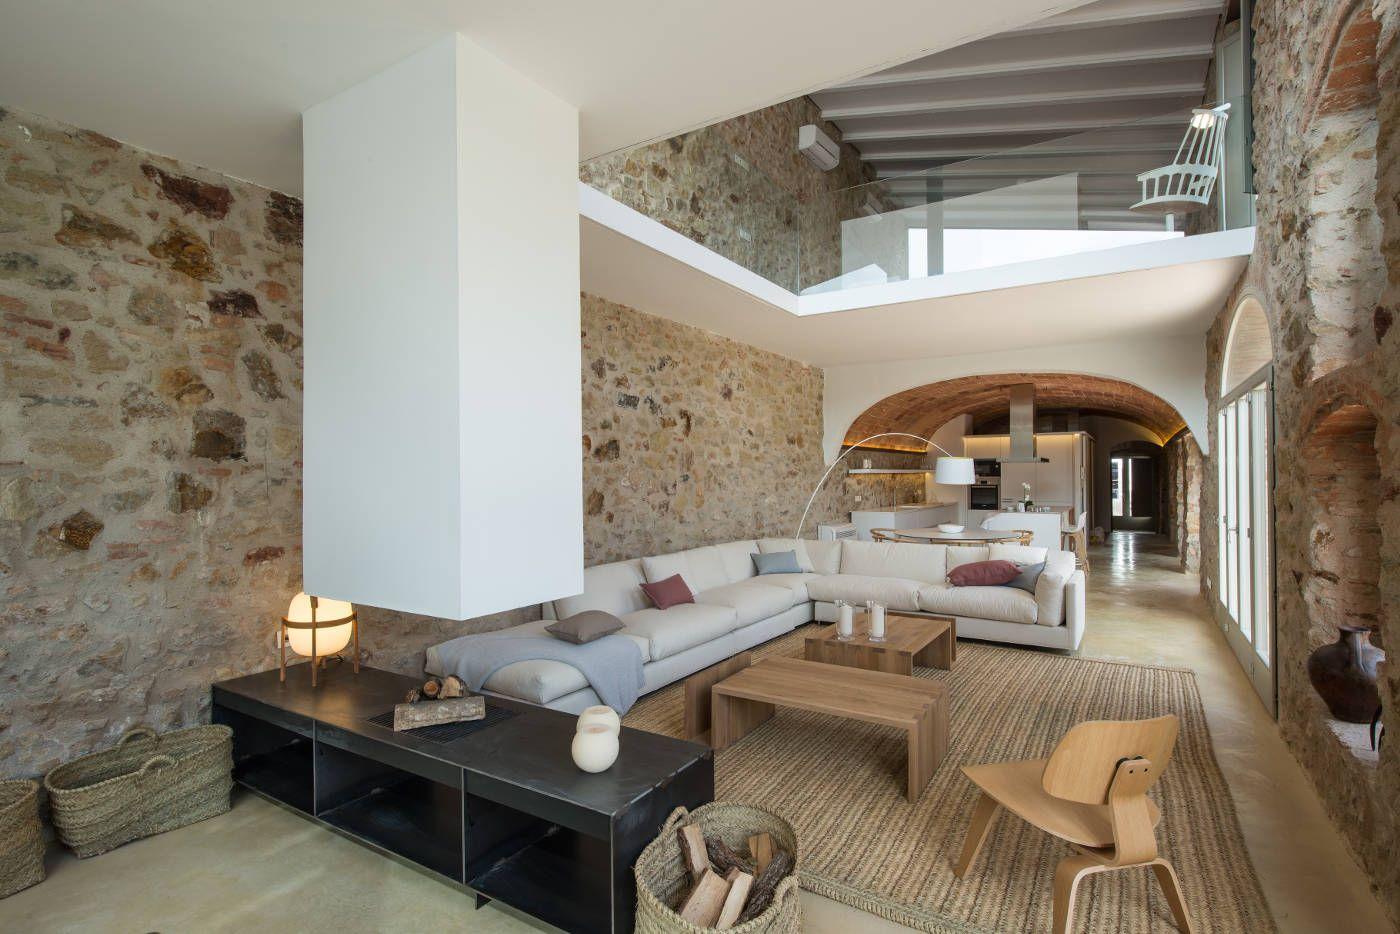 Gloria duran torrellas arquitecte proyecto de - Rehabilitacion de casas antiguas ...